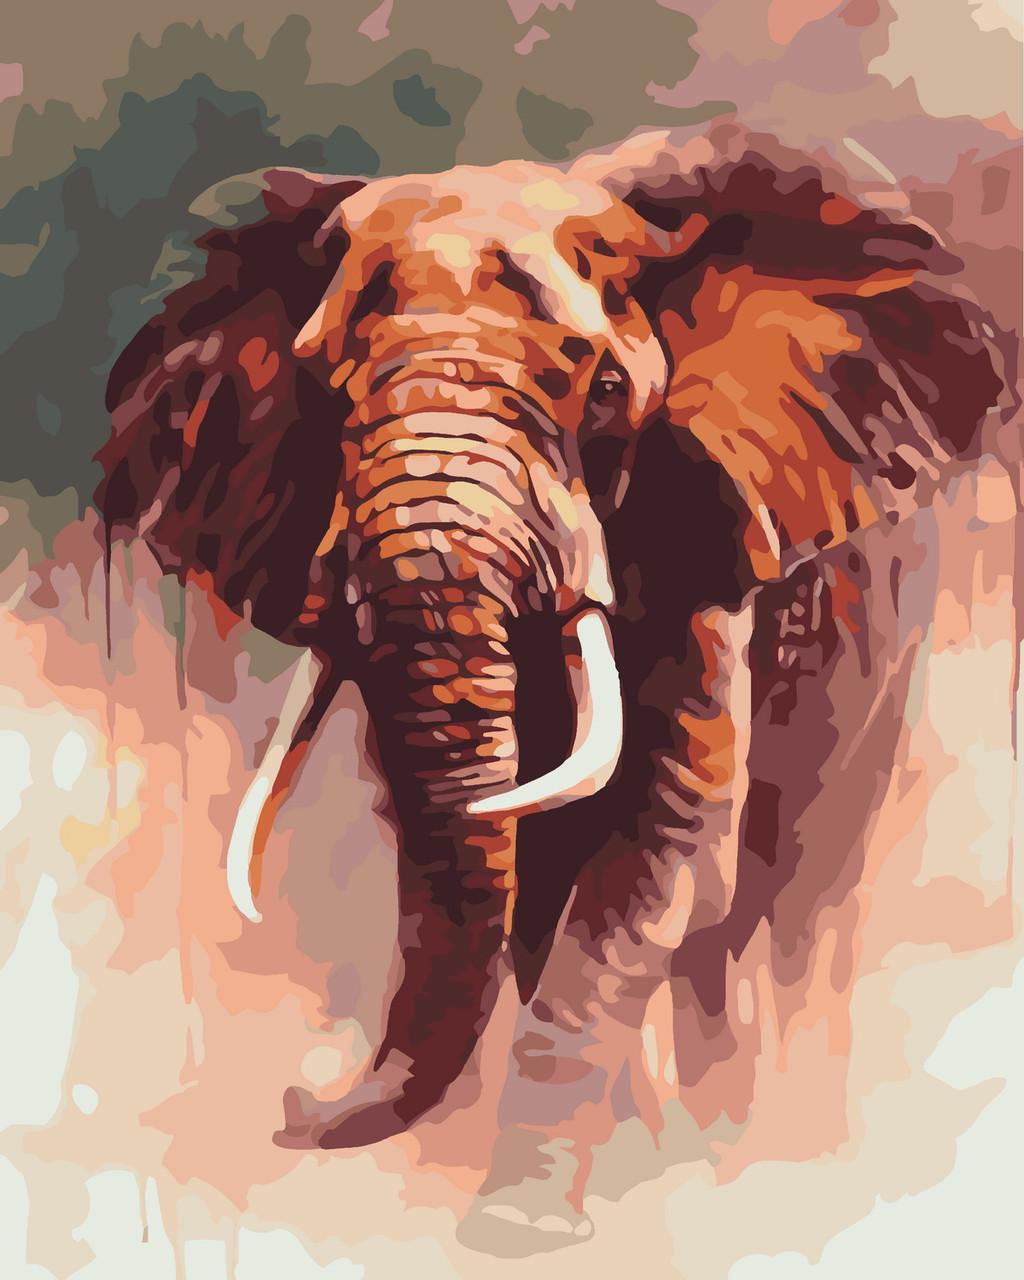 Картина по номерам Королевский слон 40 х 50 см (KH4076)